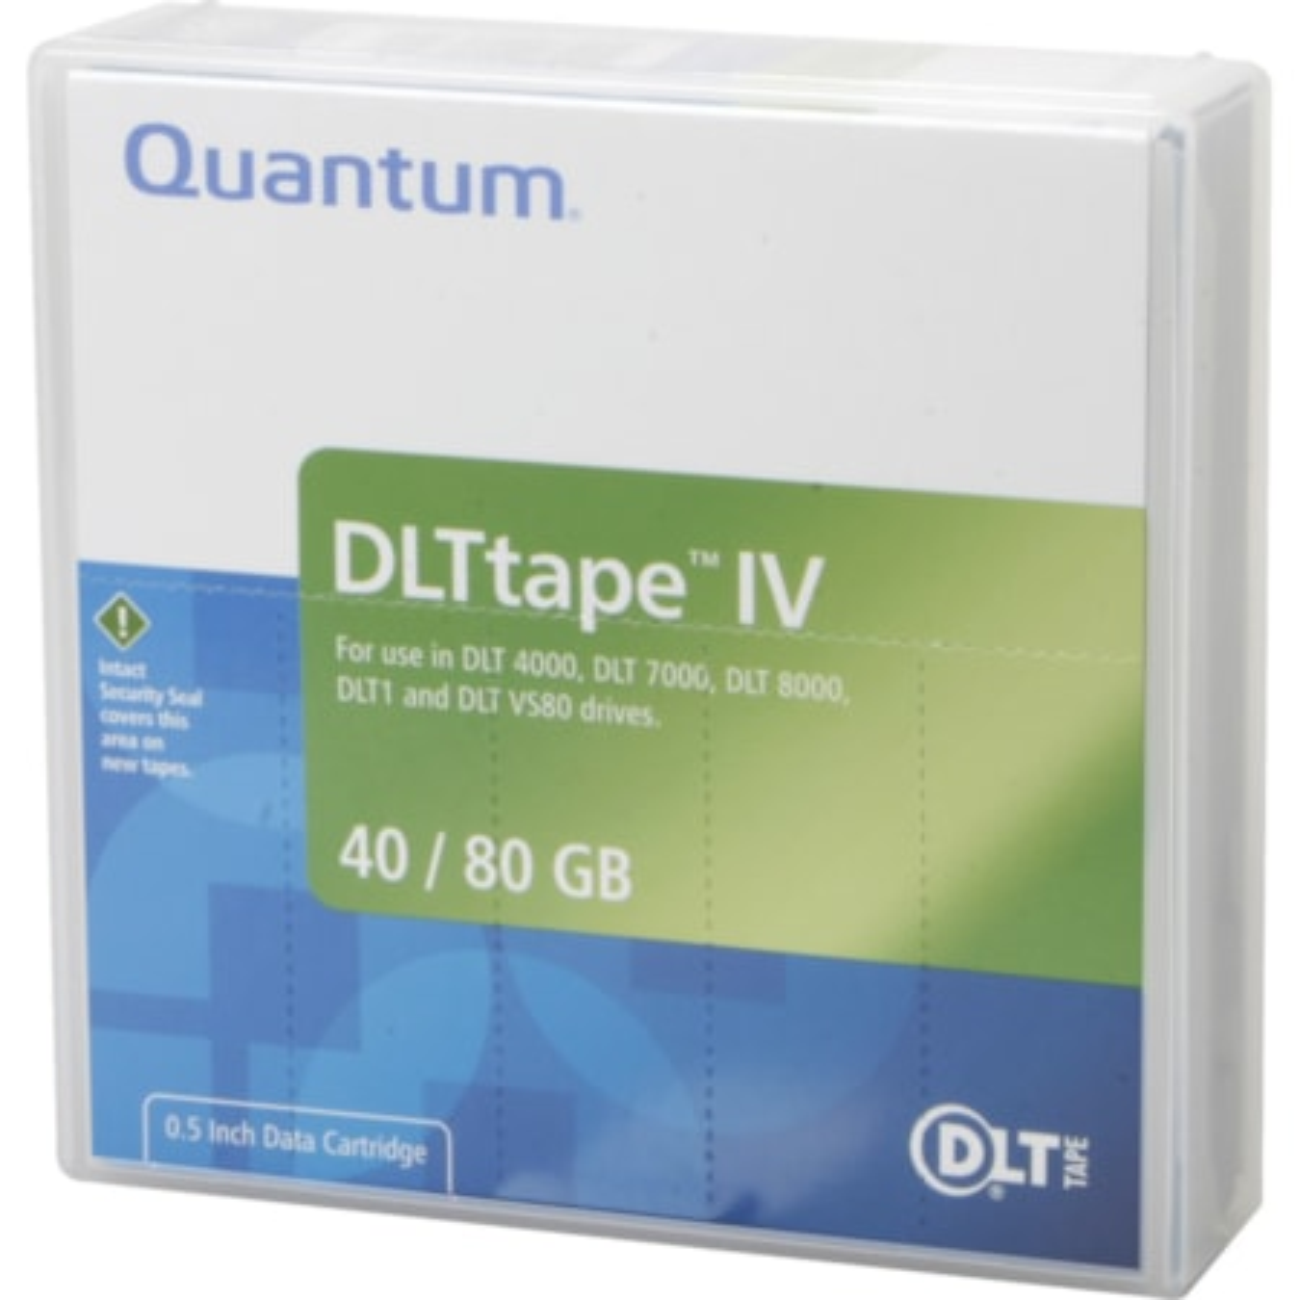 Quantum THXKD-02 Data Cartridge DLTtapeIV - 1 Pack